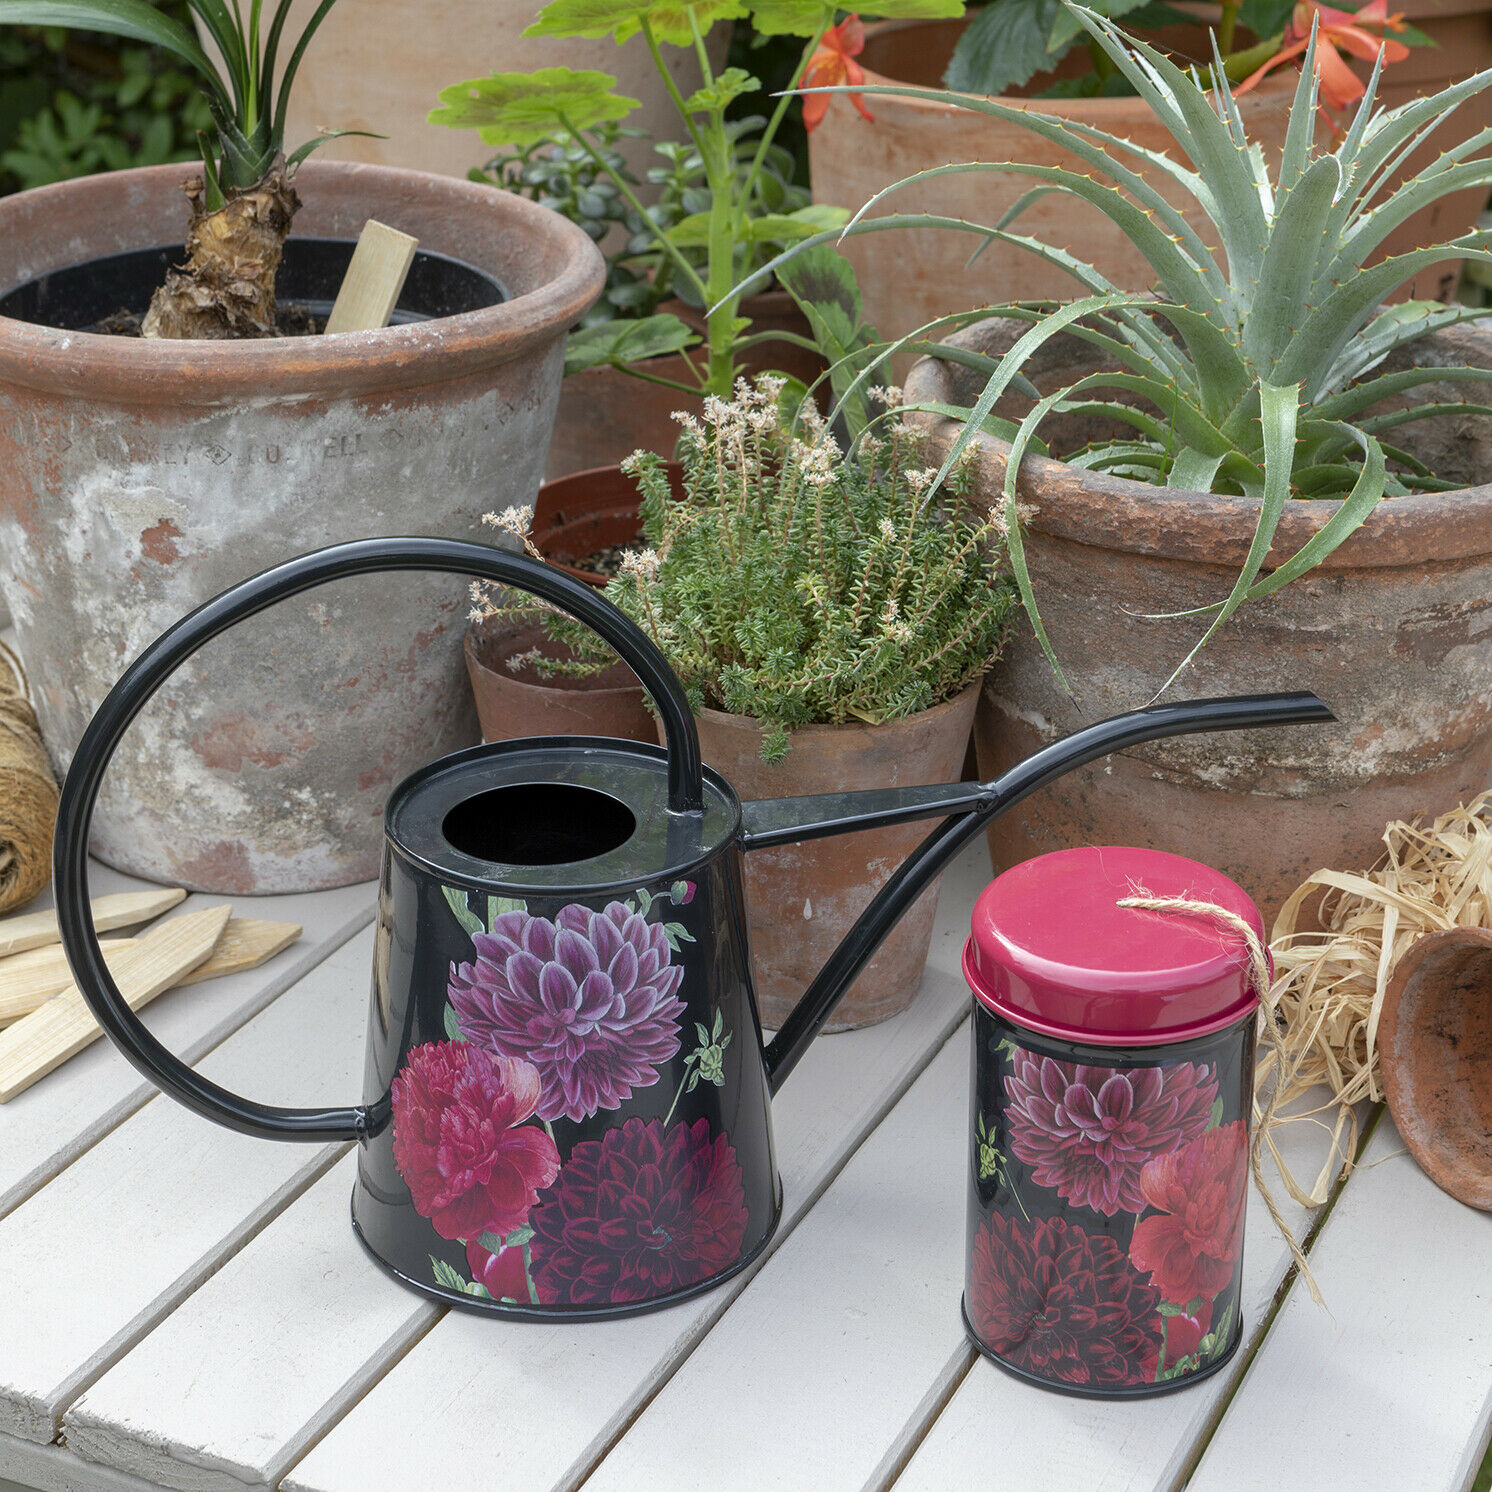 Burgon & Ball – RHS British Bloom Indoor Watering Can